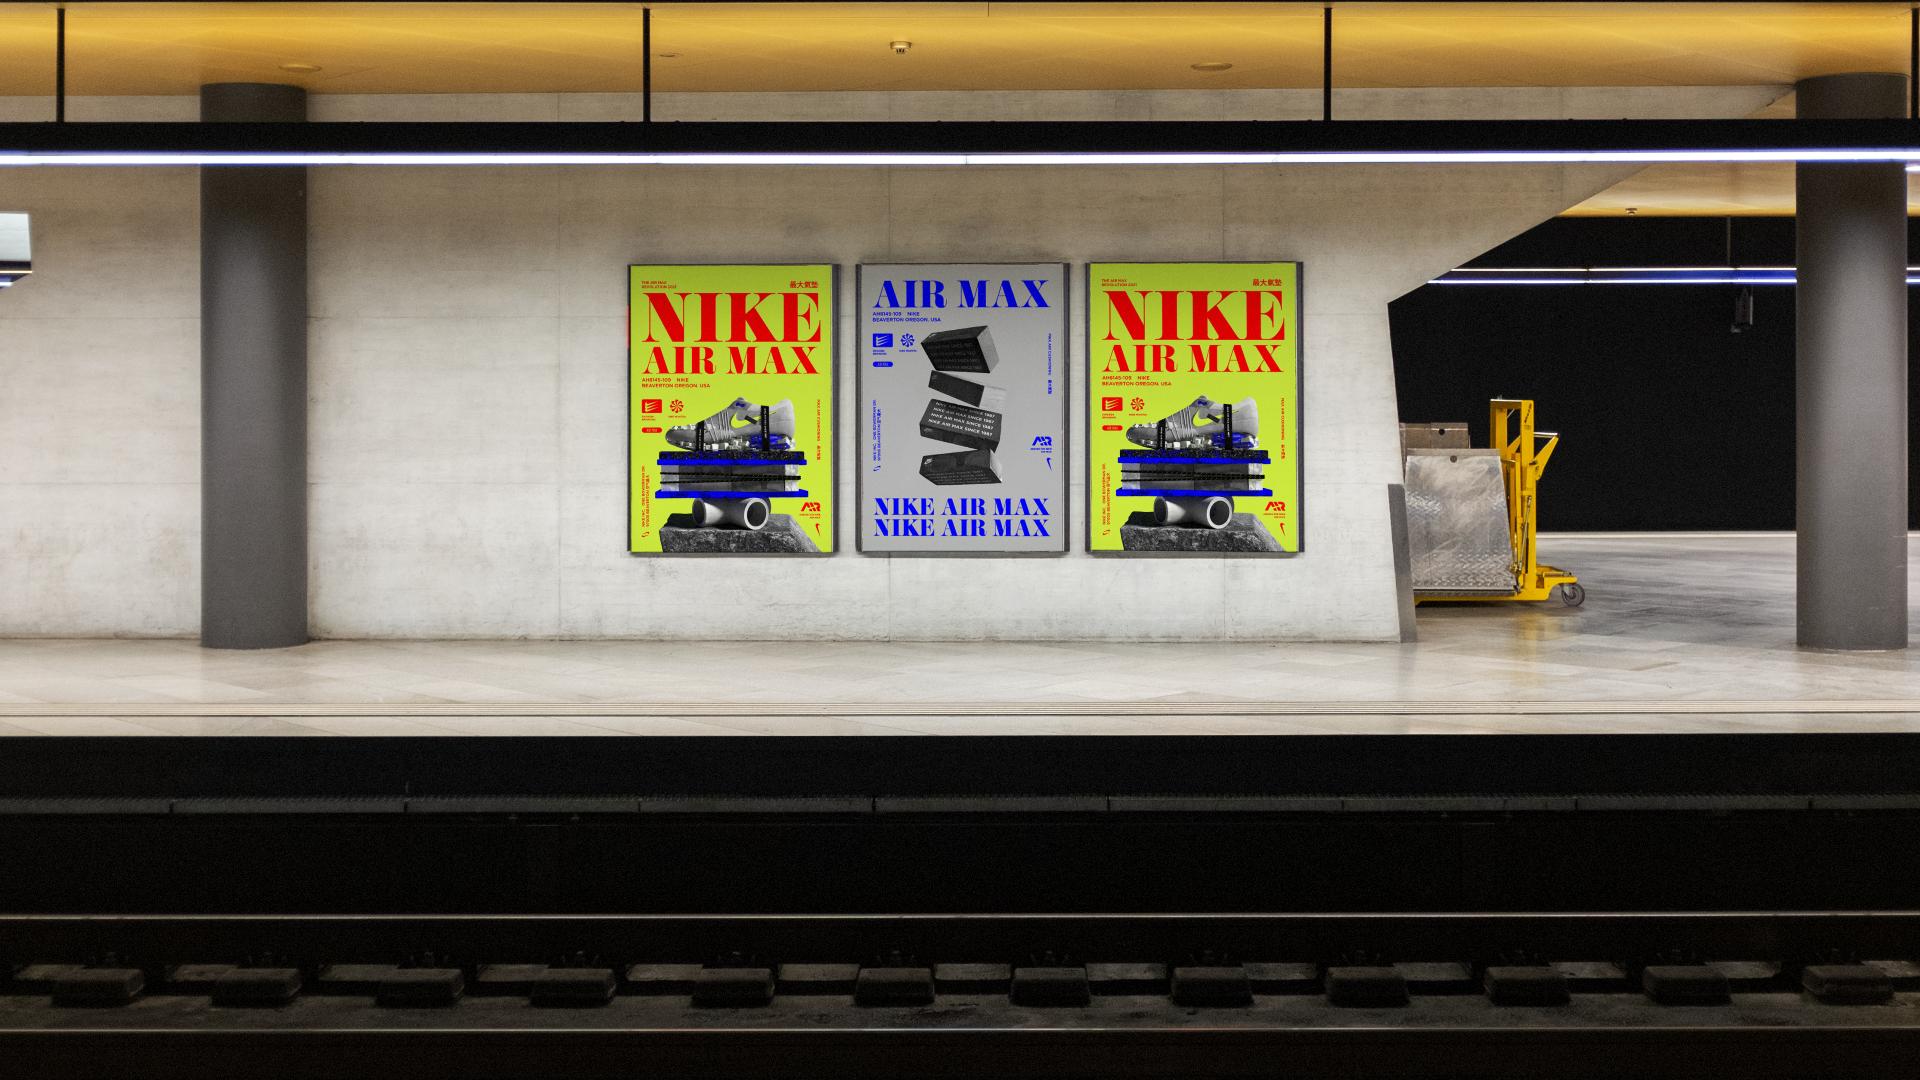 NIKE_AIRMAX_PROCESS_MockupMaison_PO_B02_2021-06-17_22.54.58